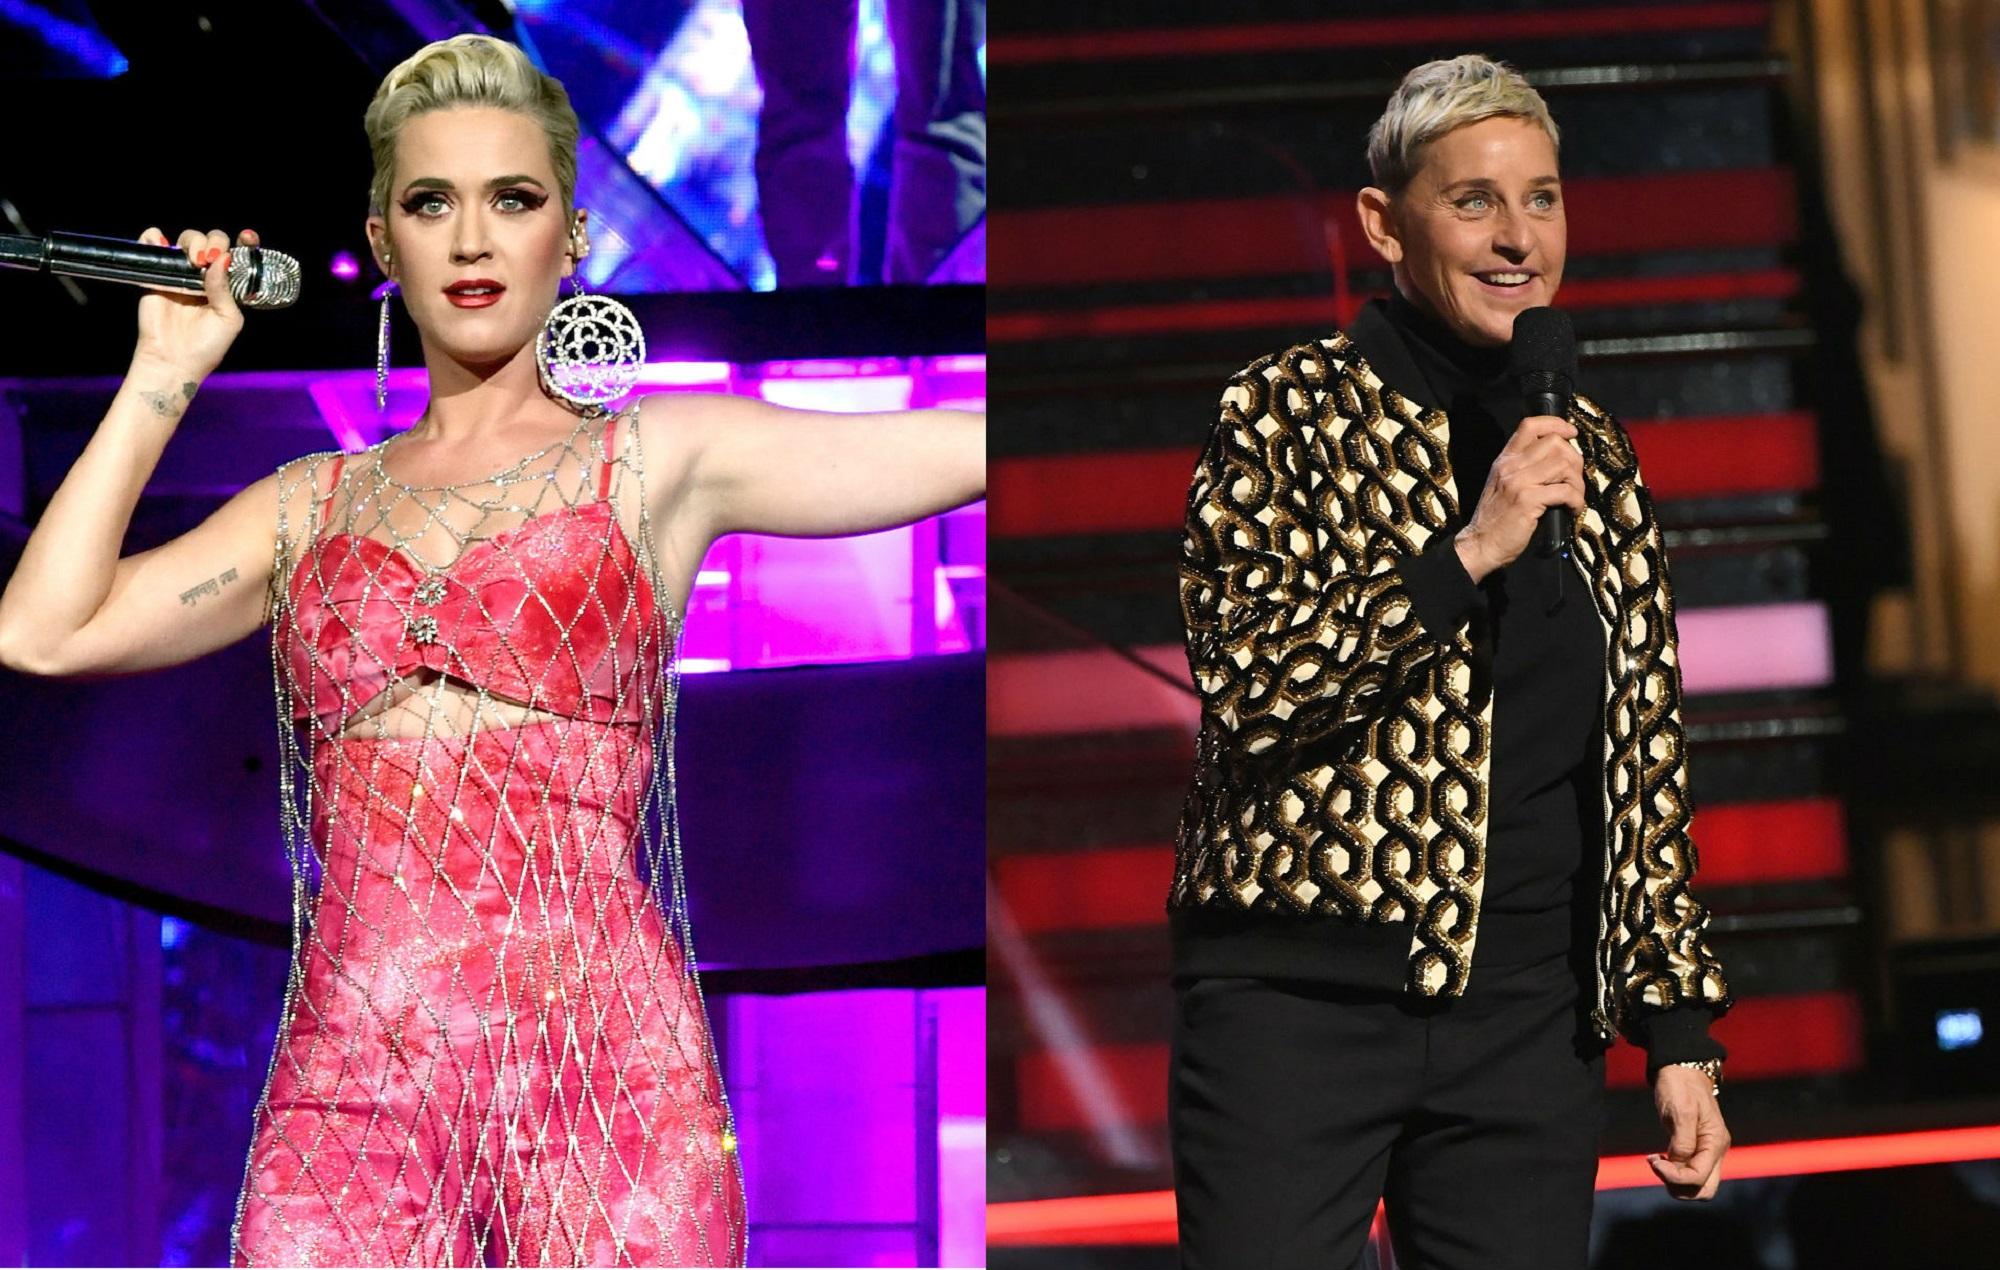 Katy Perry defends Ellen DeGeneres over staff claims on her TV show